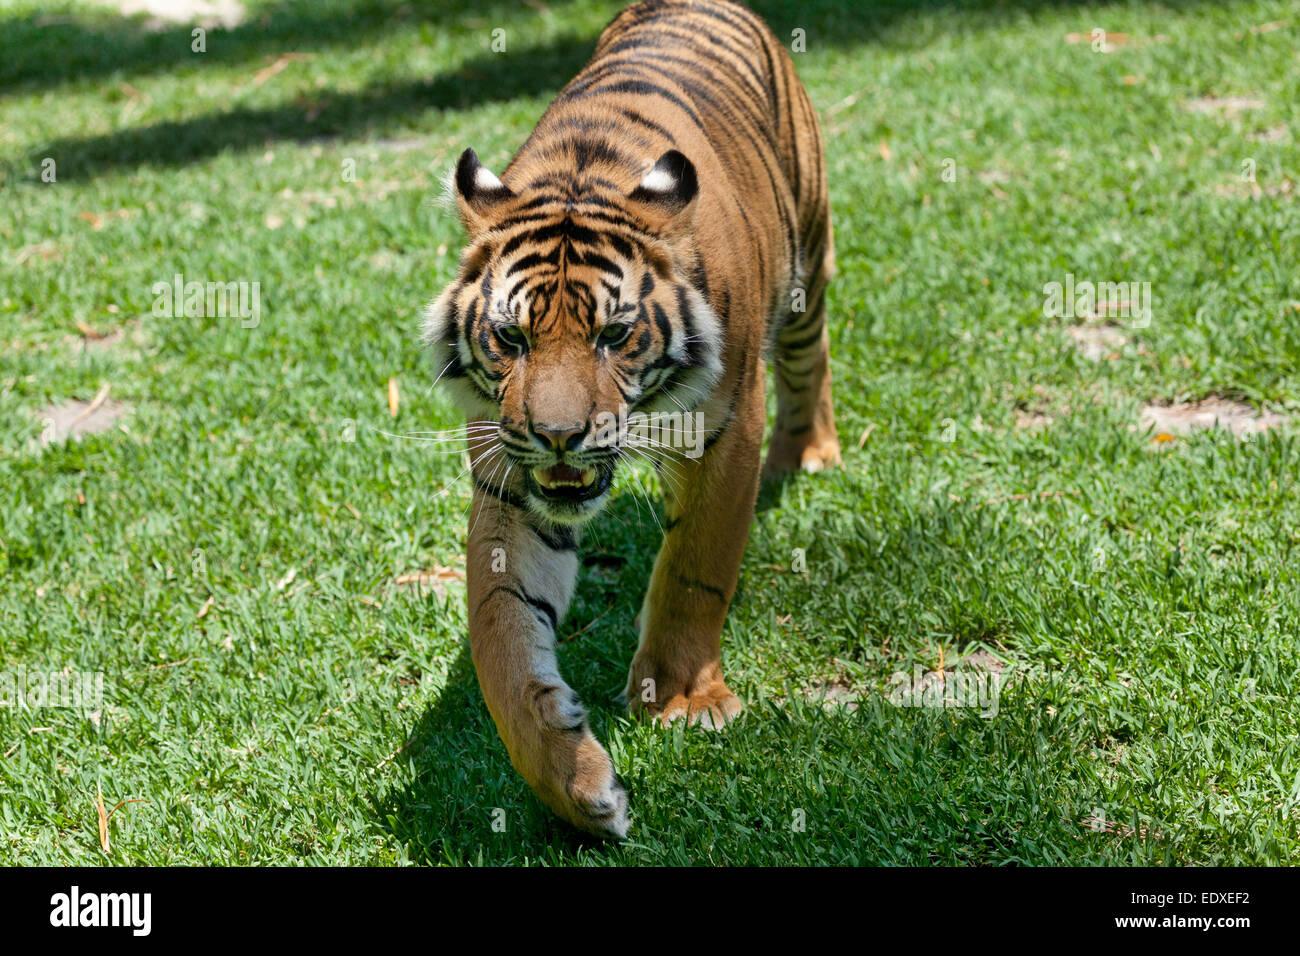 Sumatran Tiger in the Australian Zoo, Beerwah,Australia - Stock Image